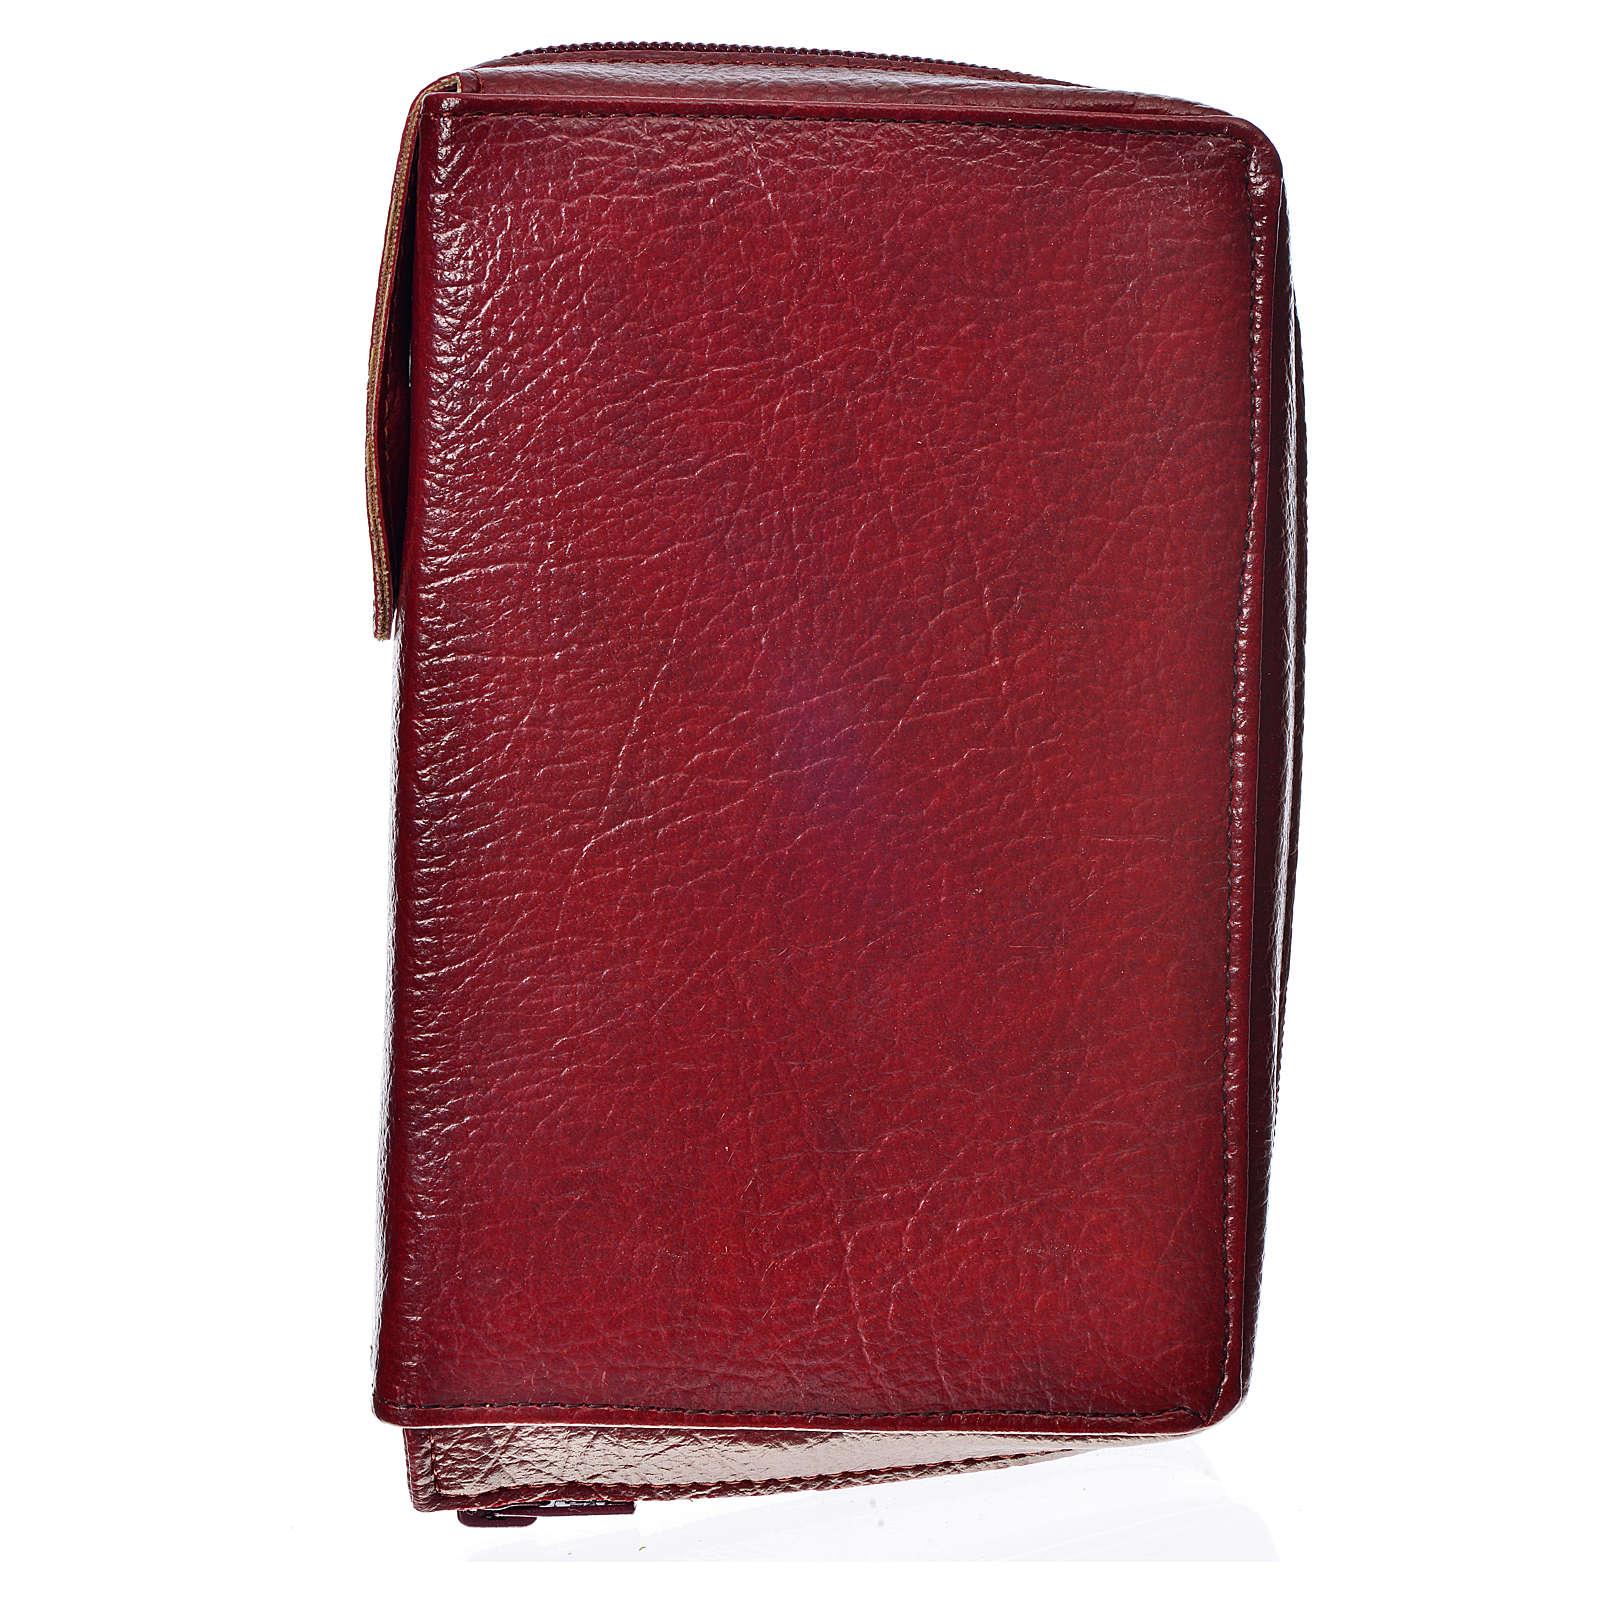 Cover for the New Jerusalem Bible READER ED, burgundy bonded leather 4